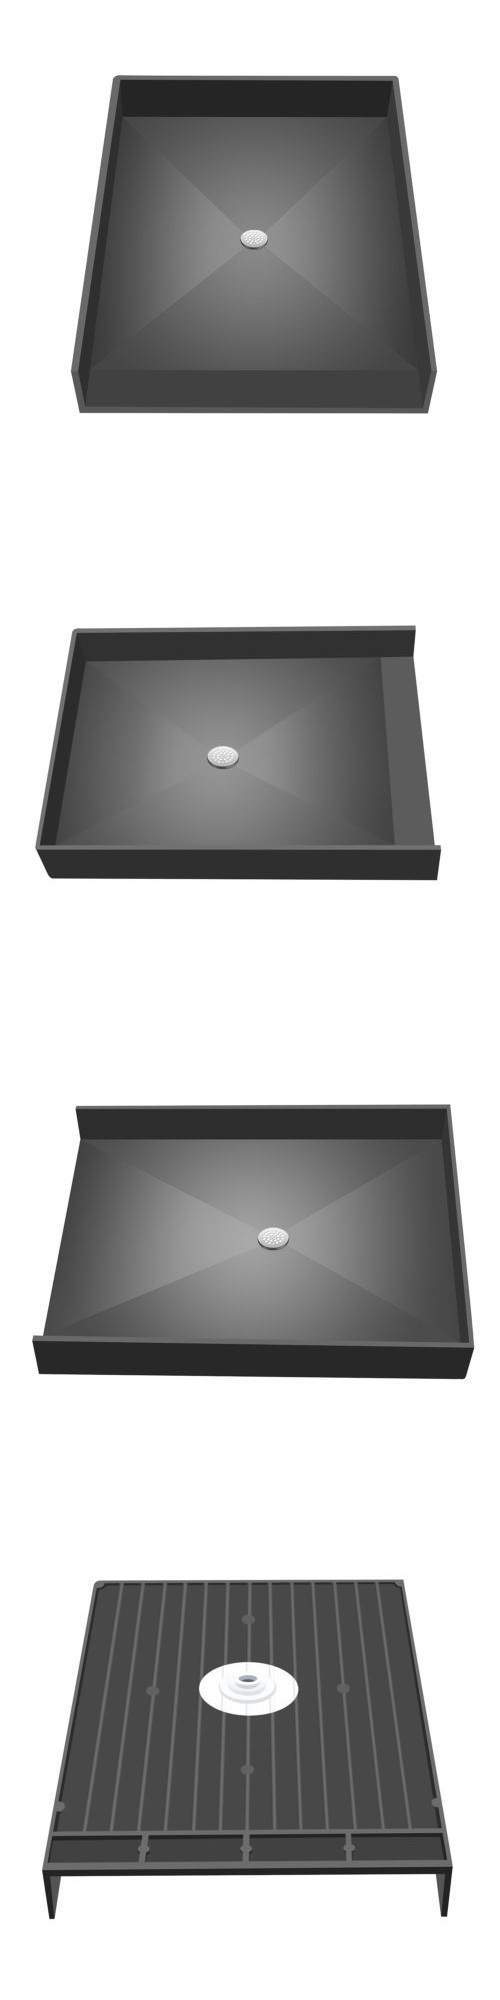 Shelves 31385: Tile Redi 4637Cbf Pvc 46 X 37 Barrier Free Shower Pan With